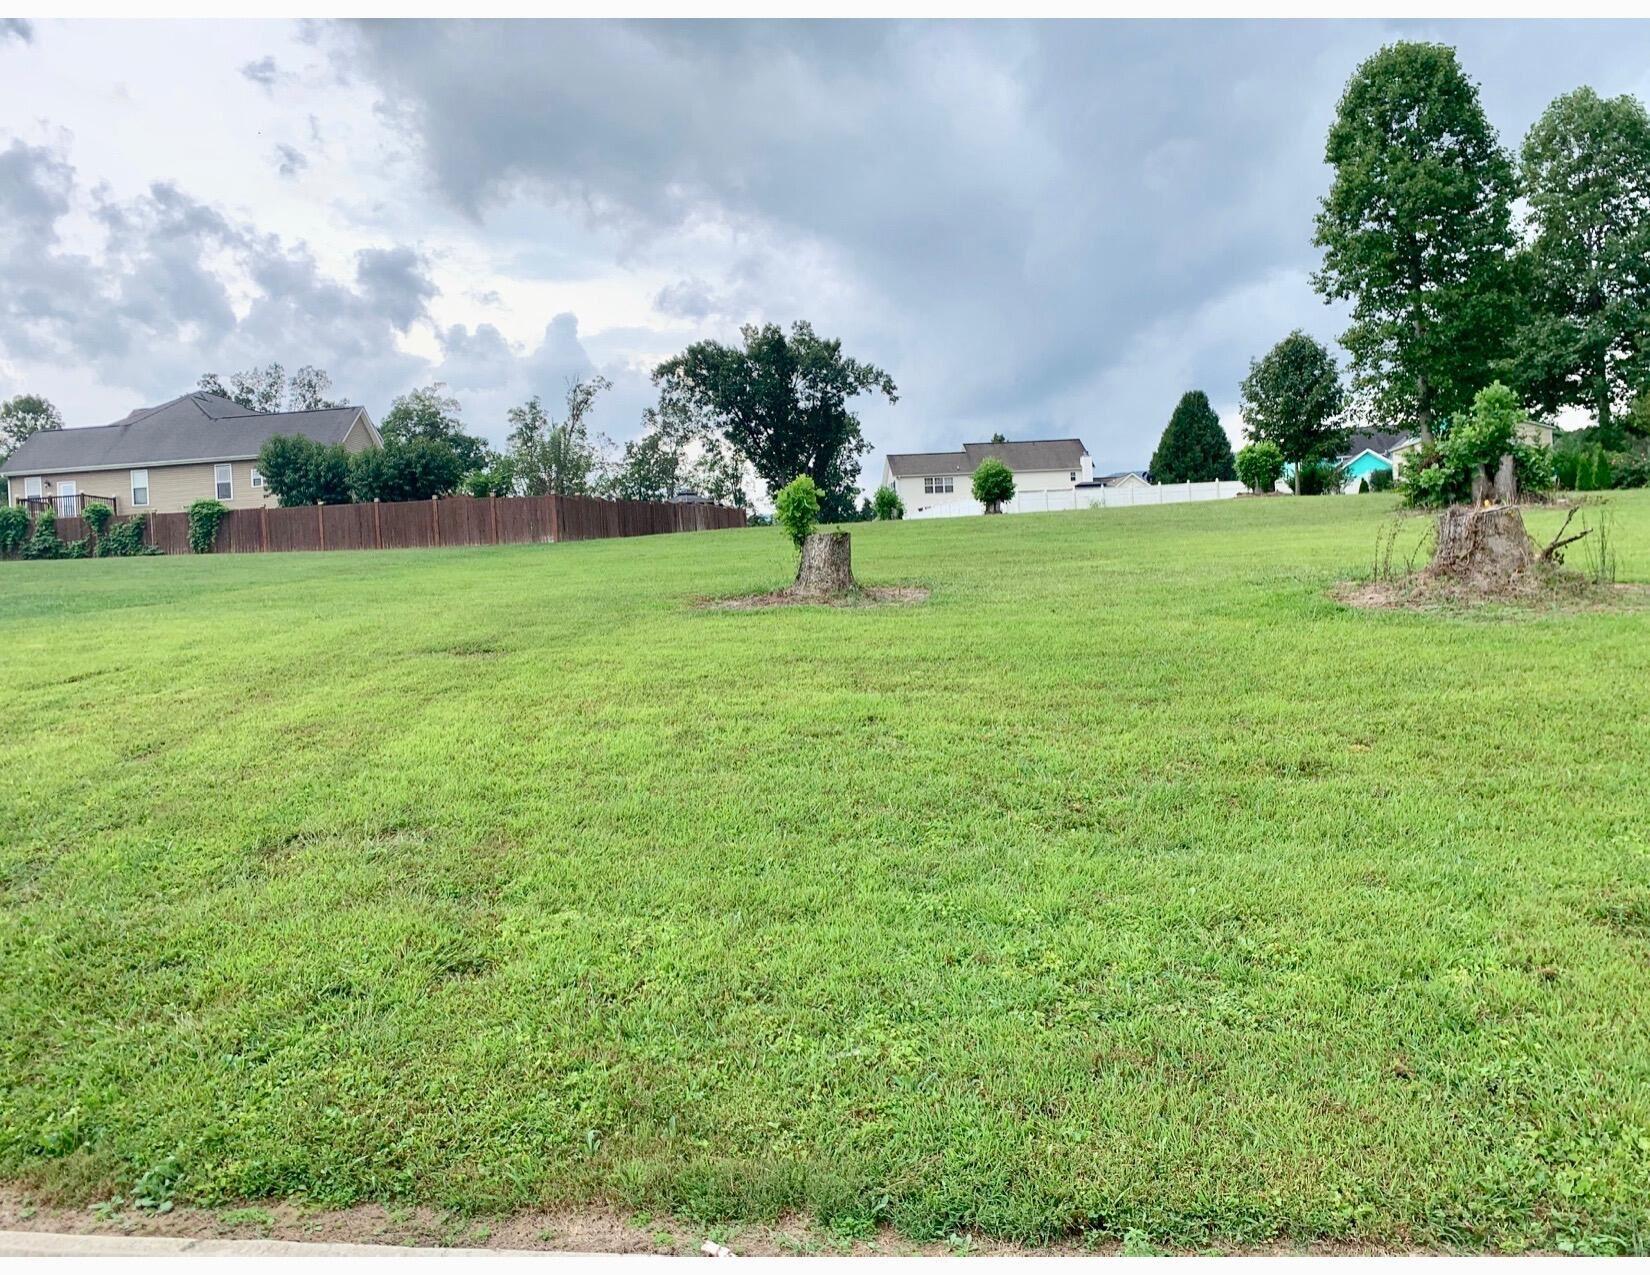 Photo of Bluff, Jacksboro, TN 37757 (MLS # 1167804)